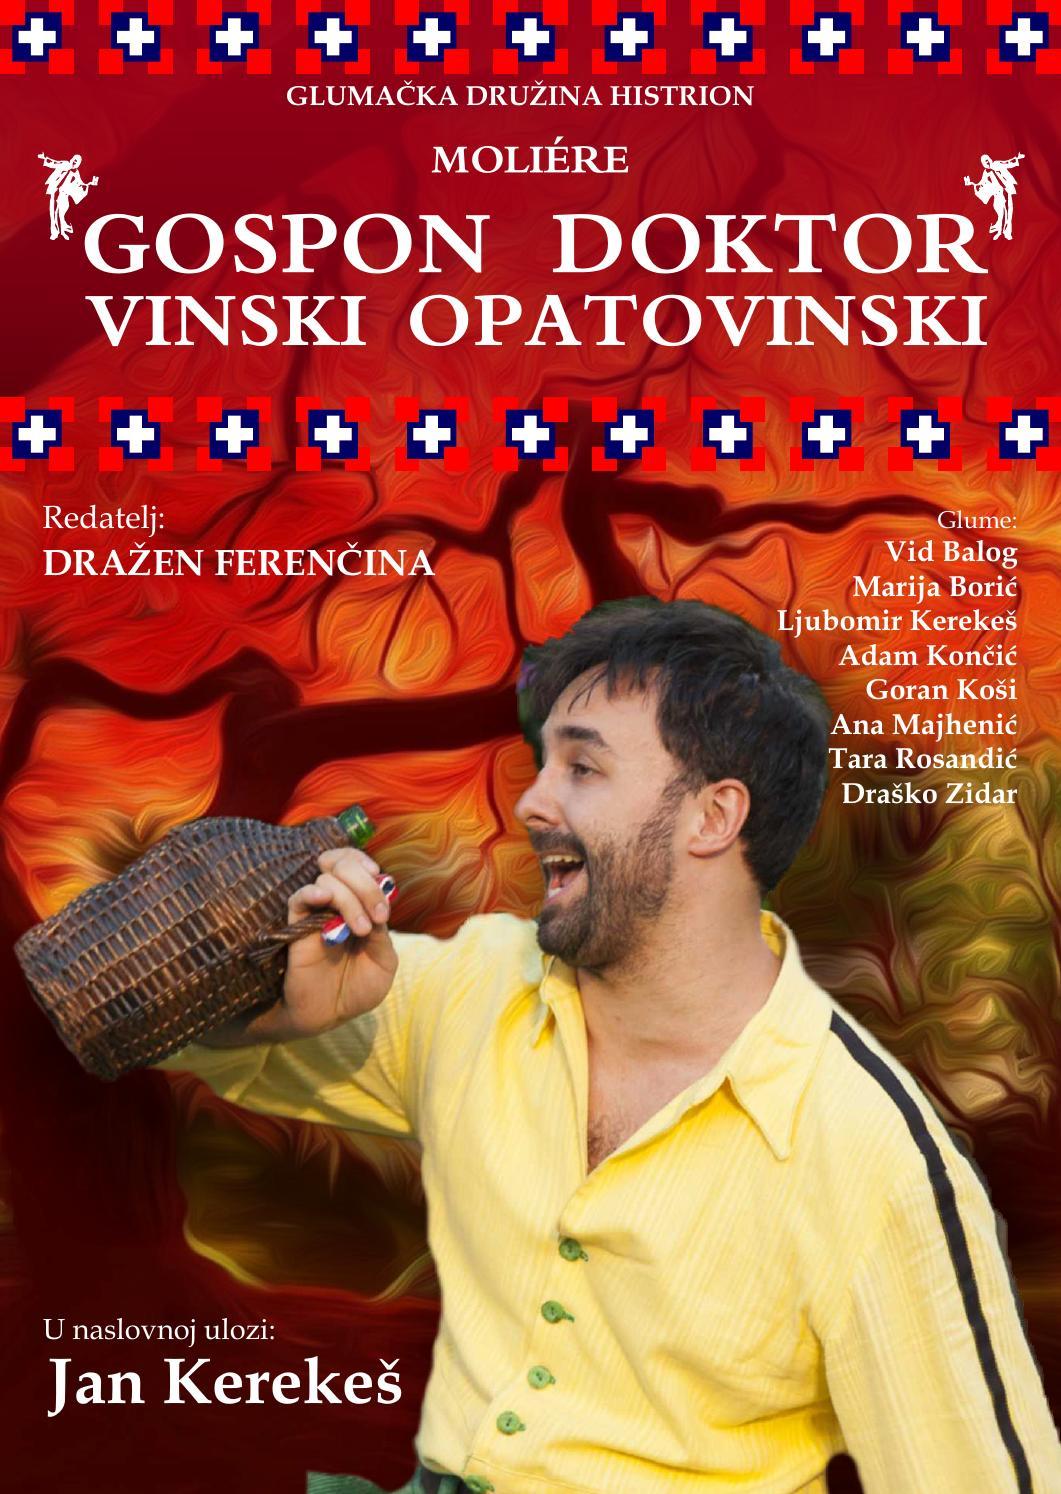 Ana Majhenić plakat doktorslobodni pokret - issuu